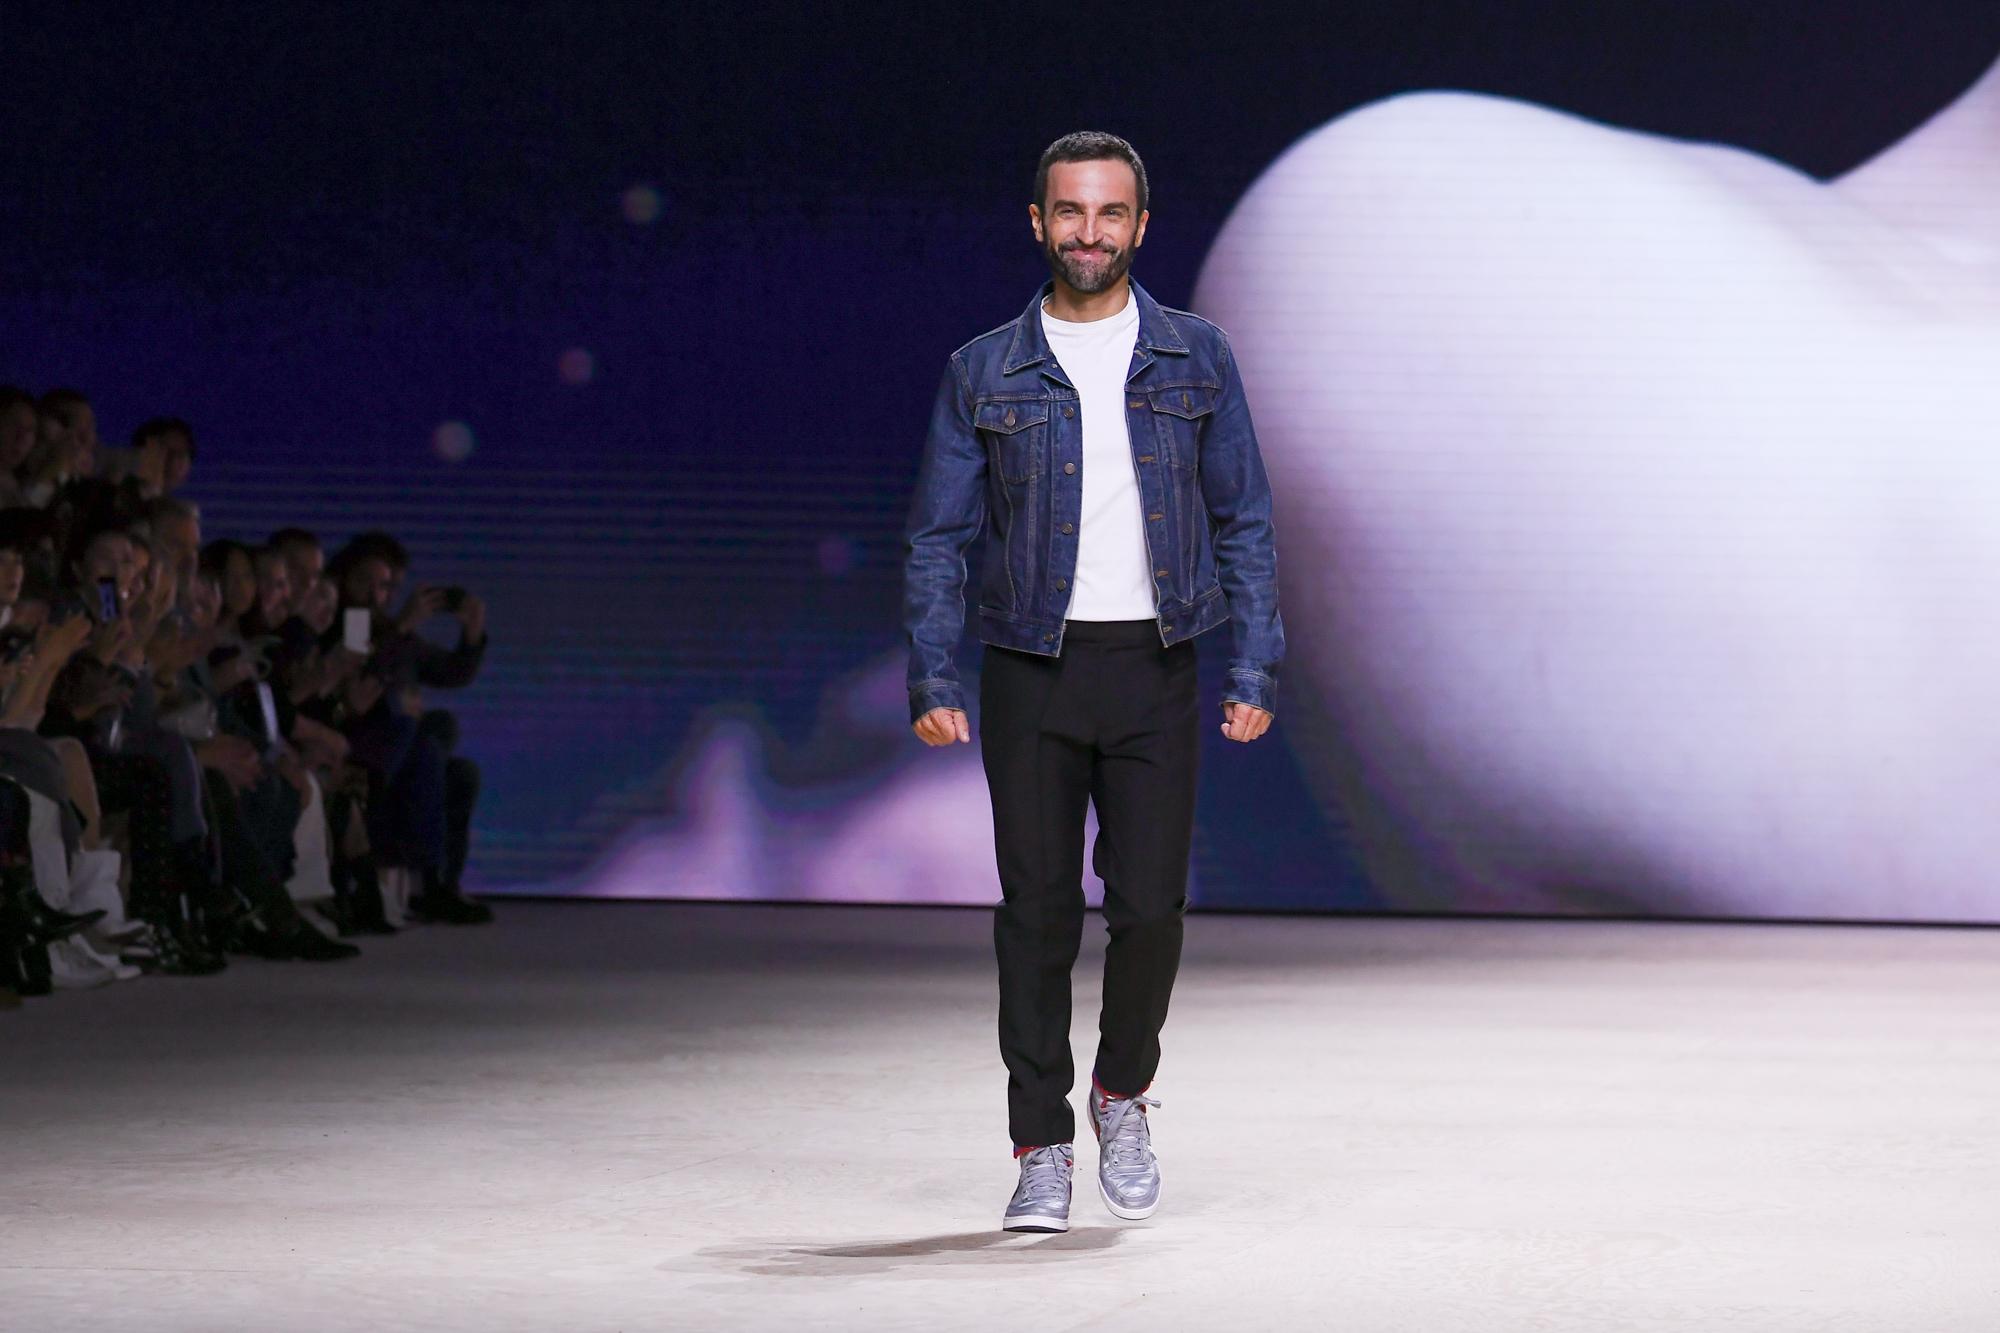 Nicolas Ghesquière walks the runway during the Louis Vuitton Womenswear Spring/Summer 2020 during Paris Fashion Week on Oct. 01, 2019 in Paris, France.